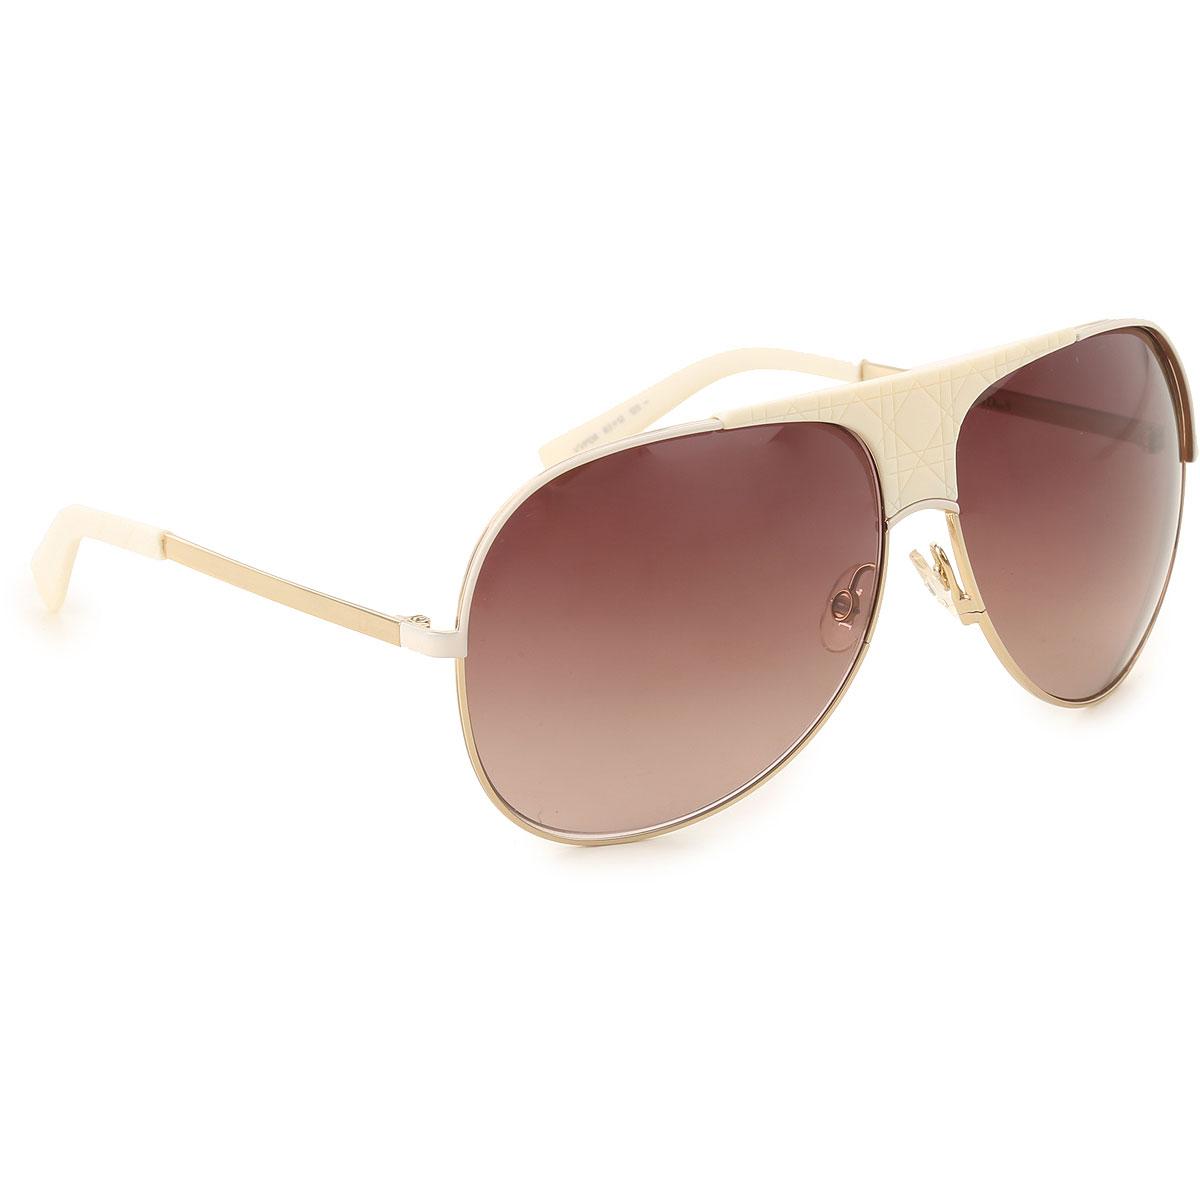 Christian Dior Sunglasses On Sale, Milk White, 2019